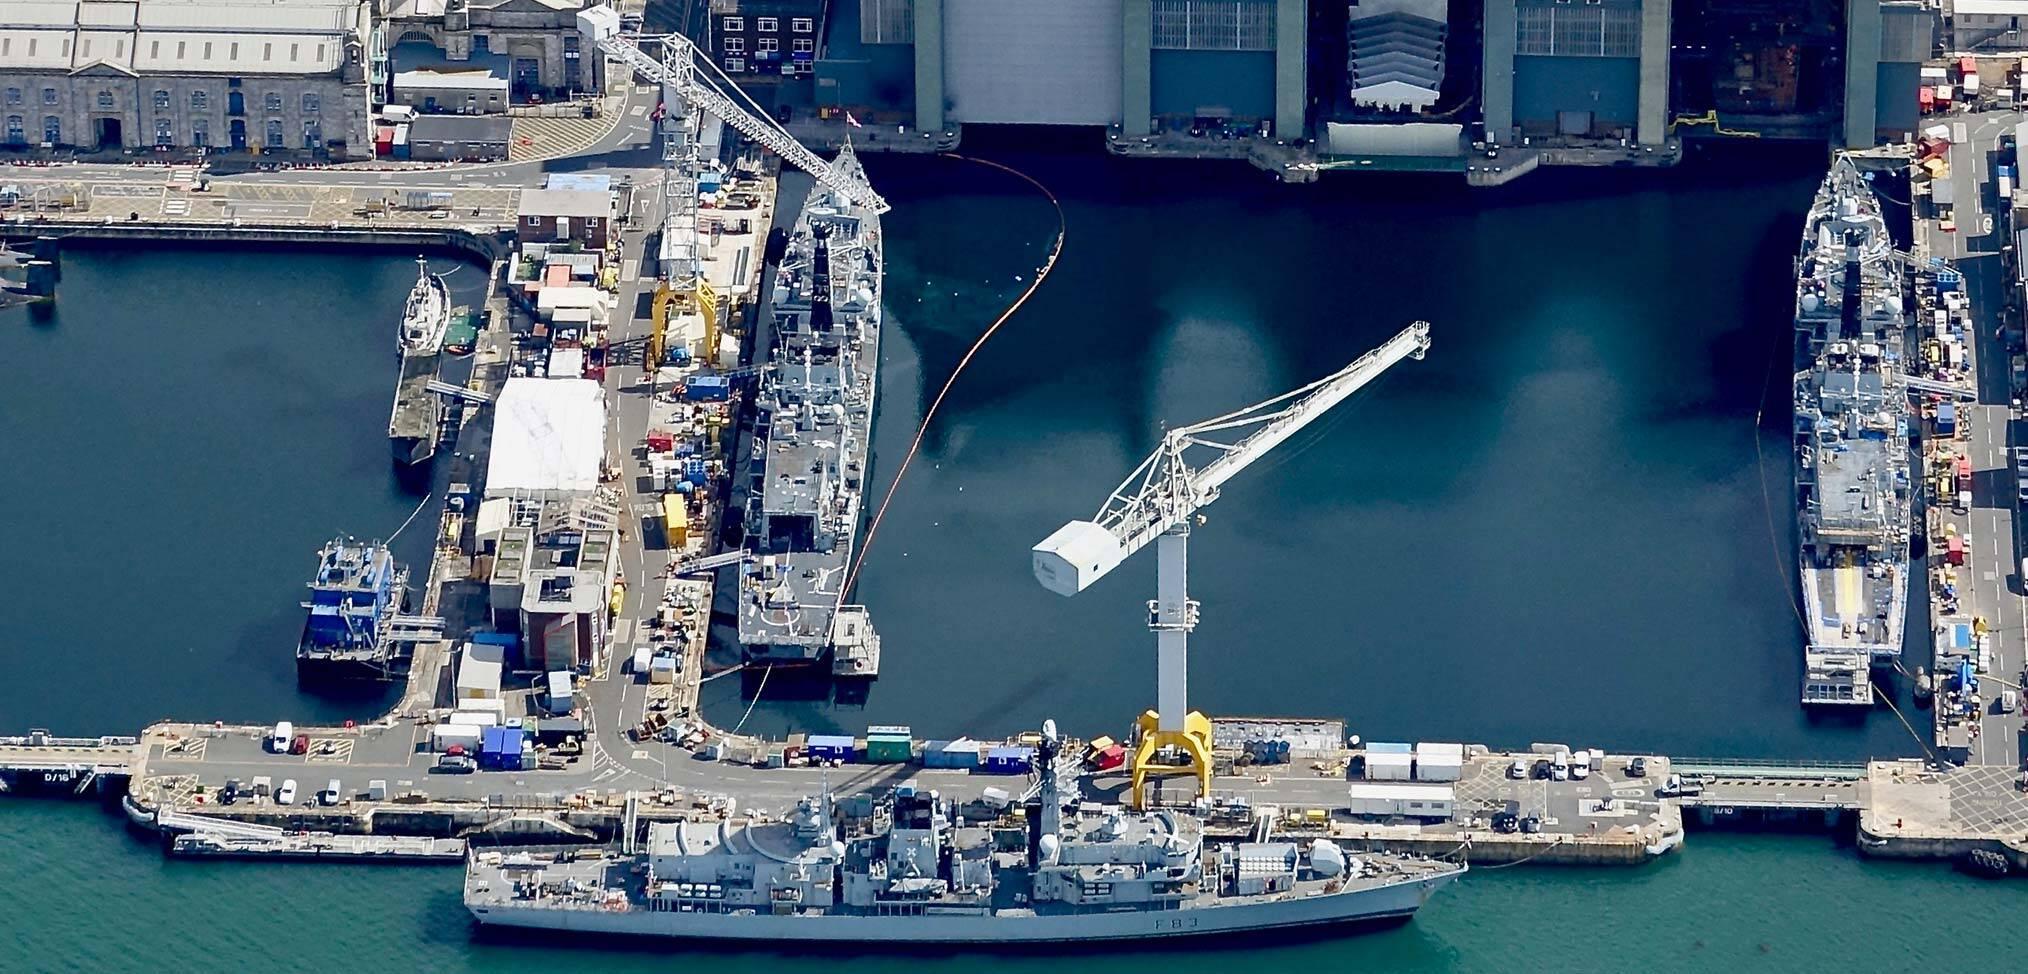 Progress report – extending the life of Royal Navy's Type 23 frigates